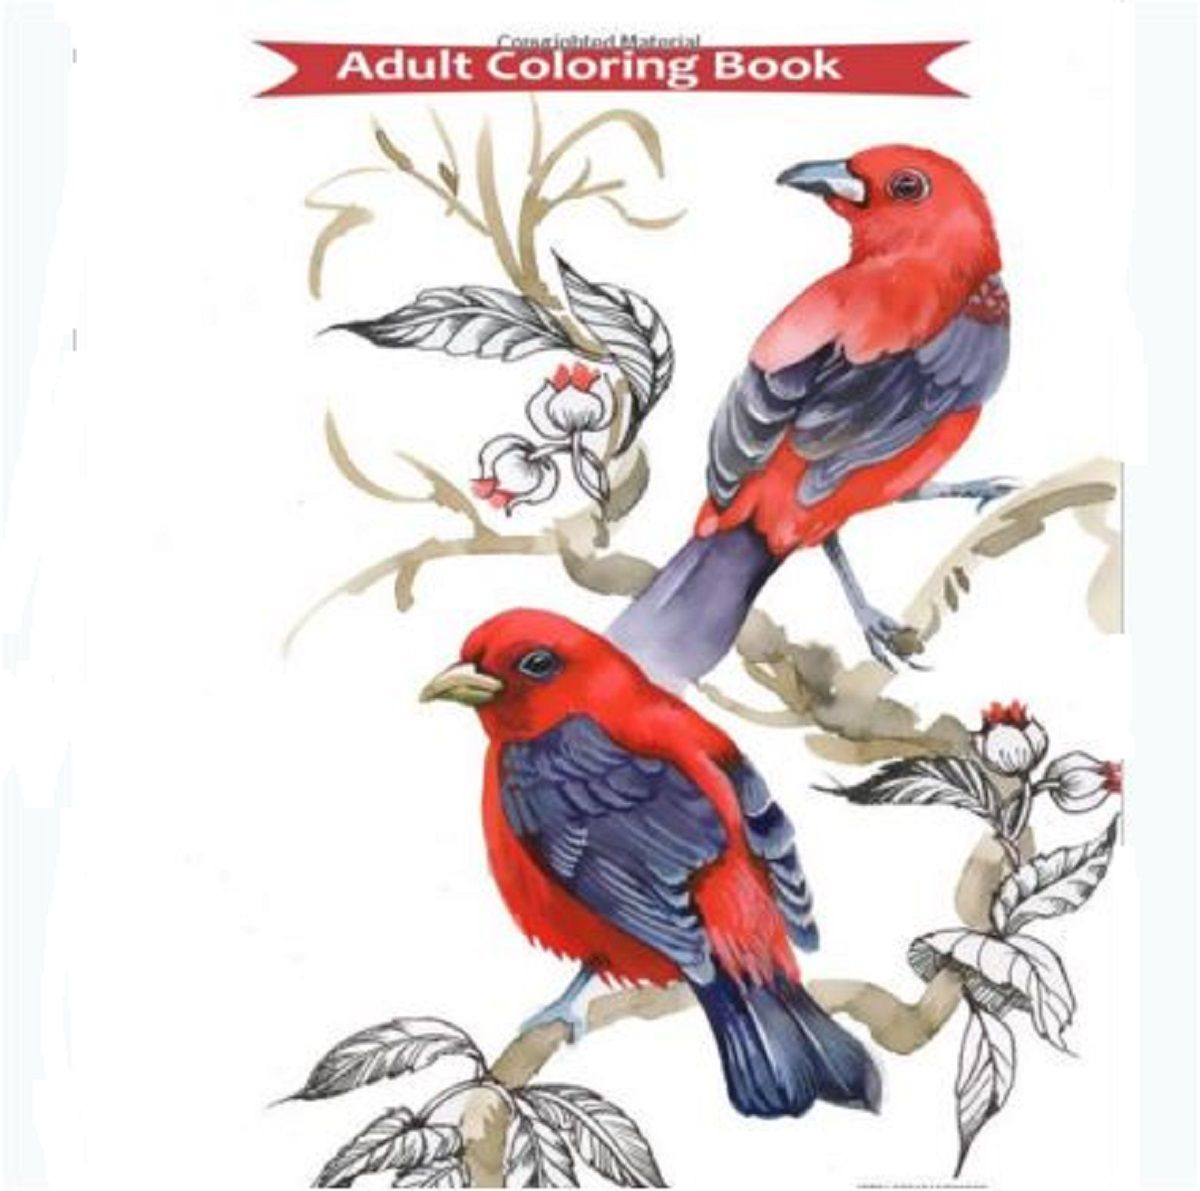 Bird Adult Coloring Book Birds Flower Design Stress Relief Patterns